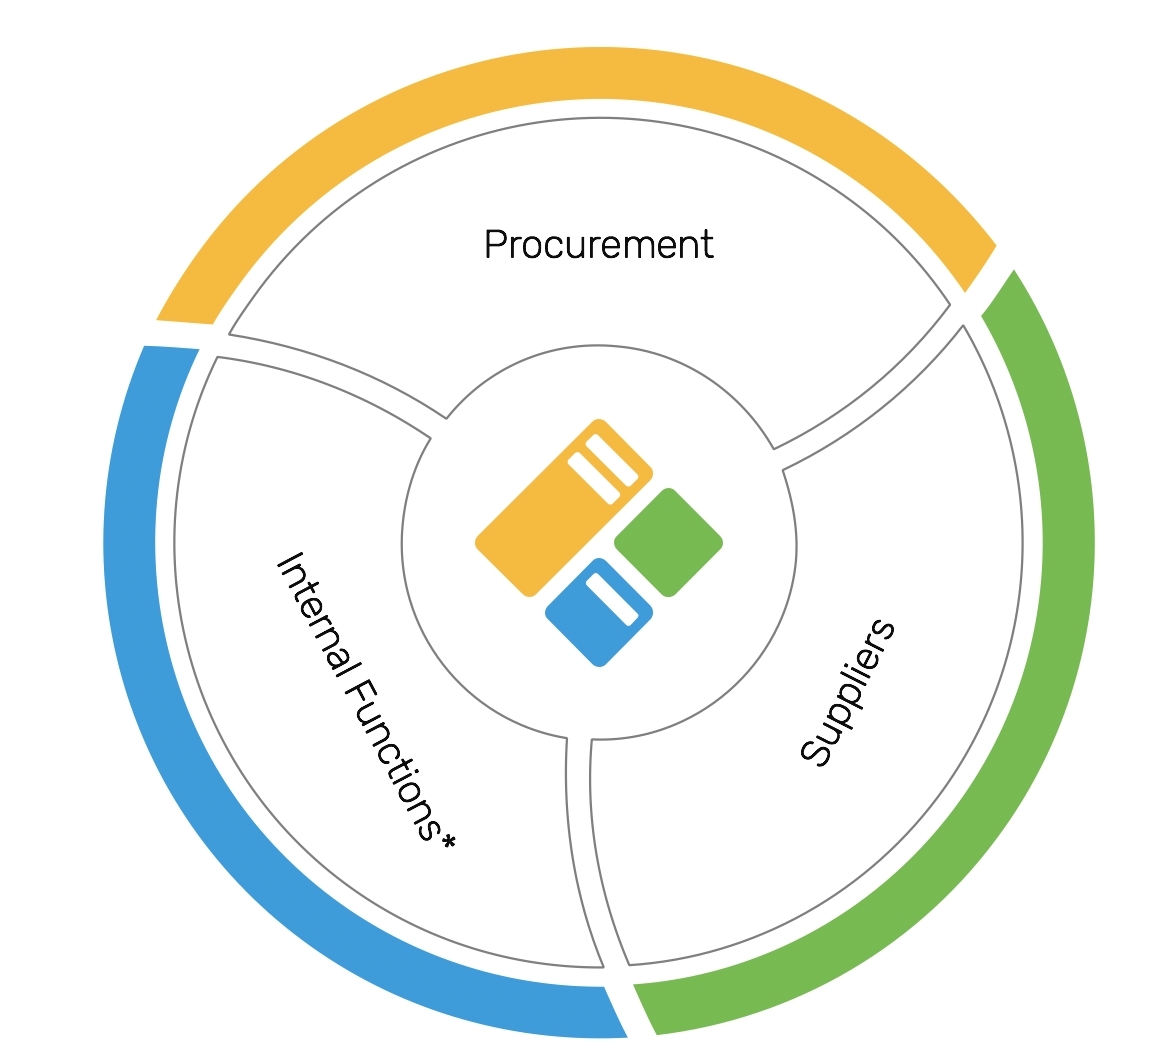 Procurement stakeholders